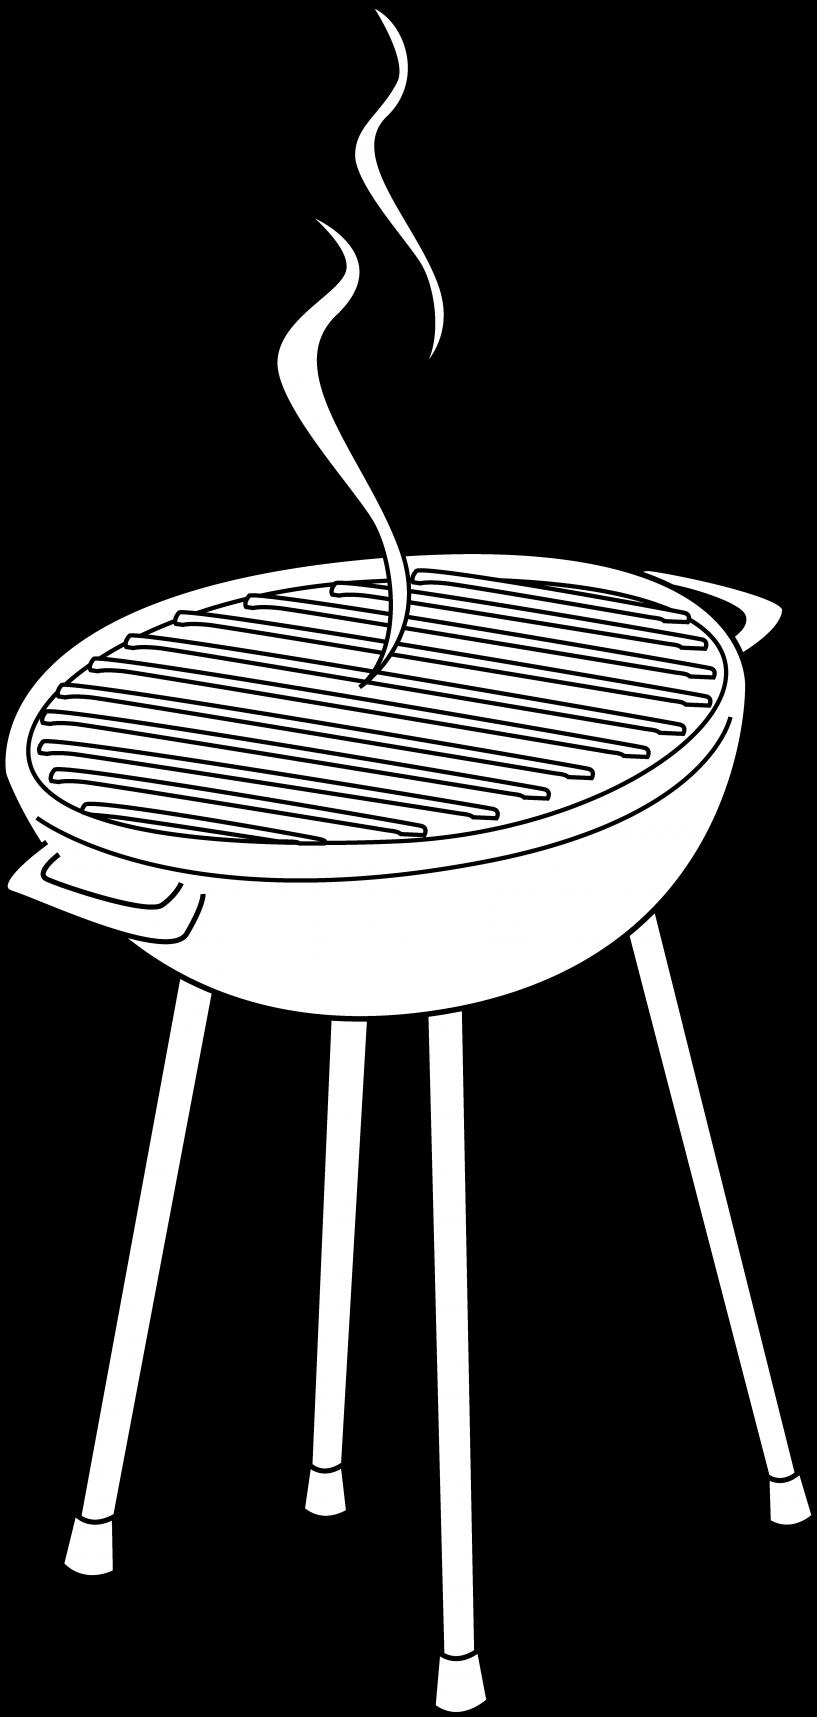 Black santa barbeque clipart jpg freeuse download HD Barbeque Grill Clip Art Free - Grill Clipart Black And White ... jpg freeuse download